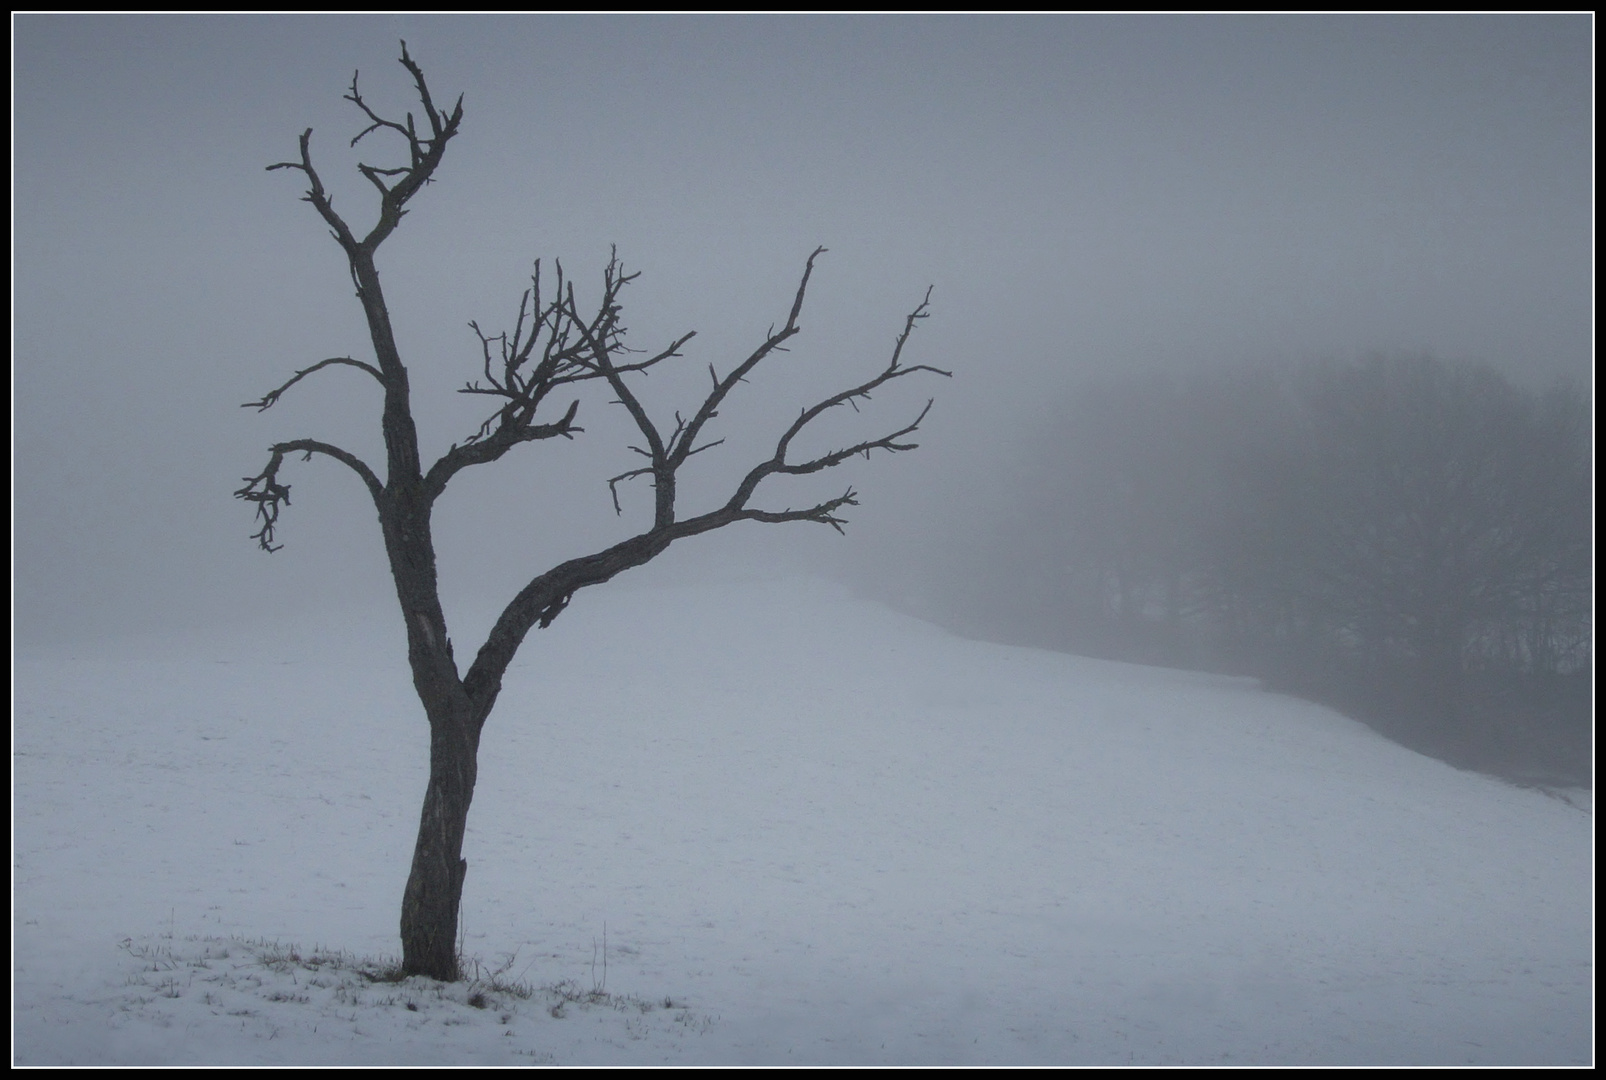 Winter - Impression 3